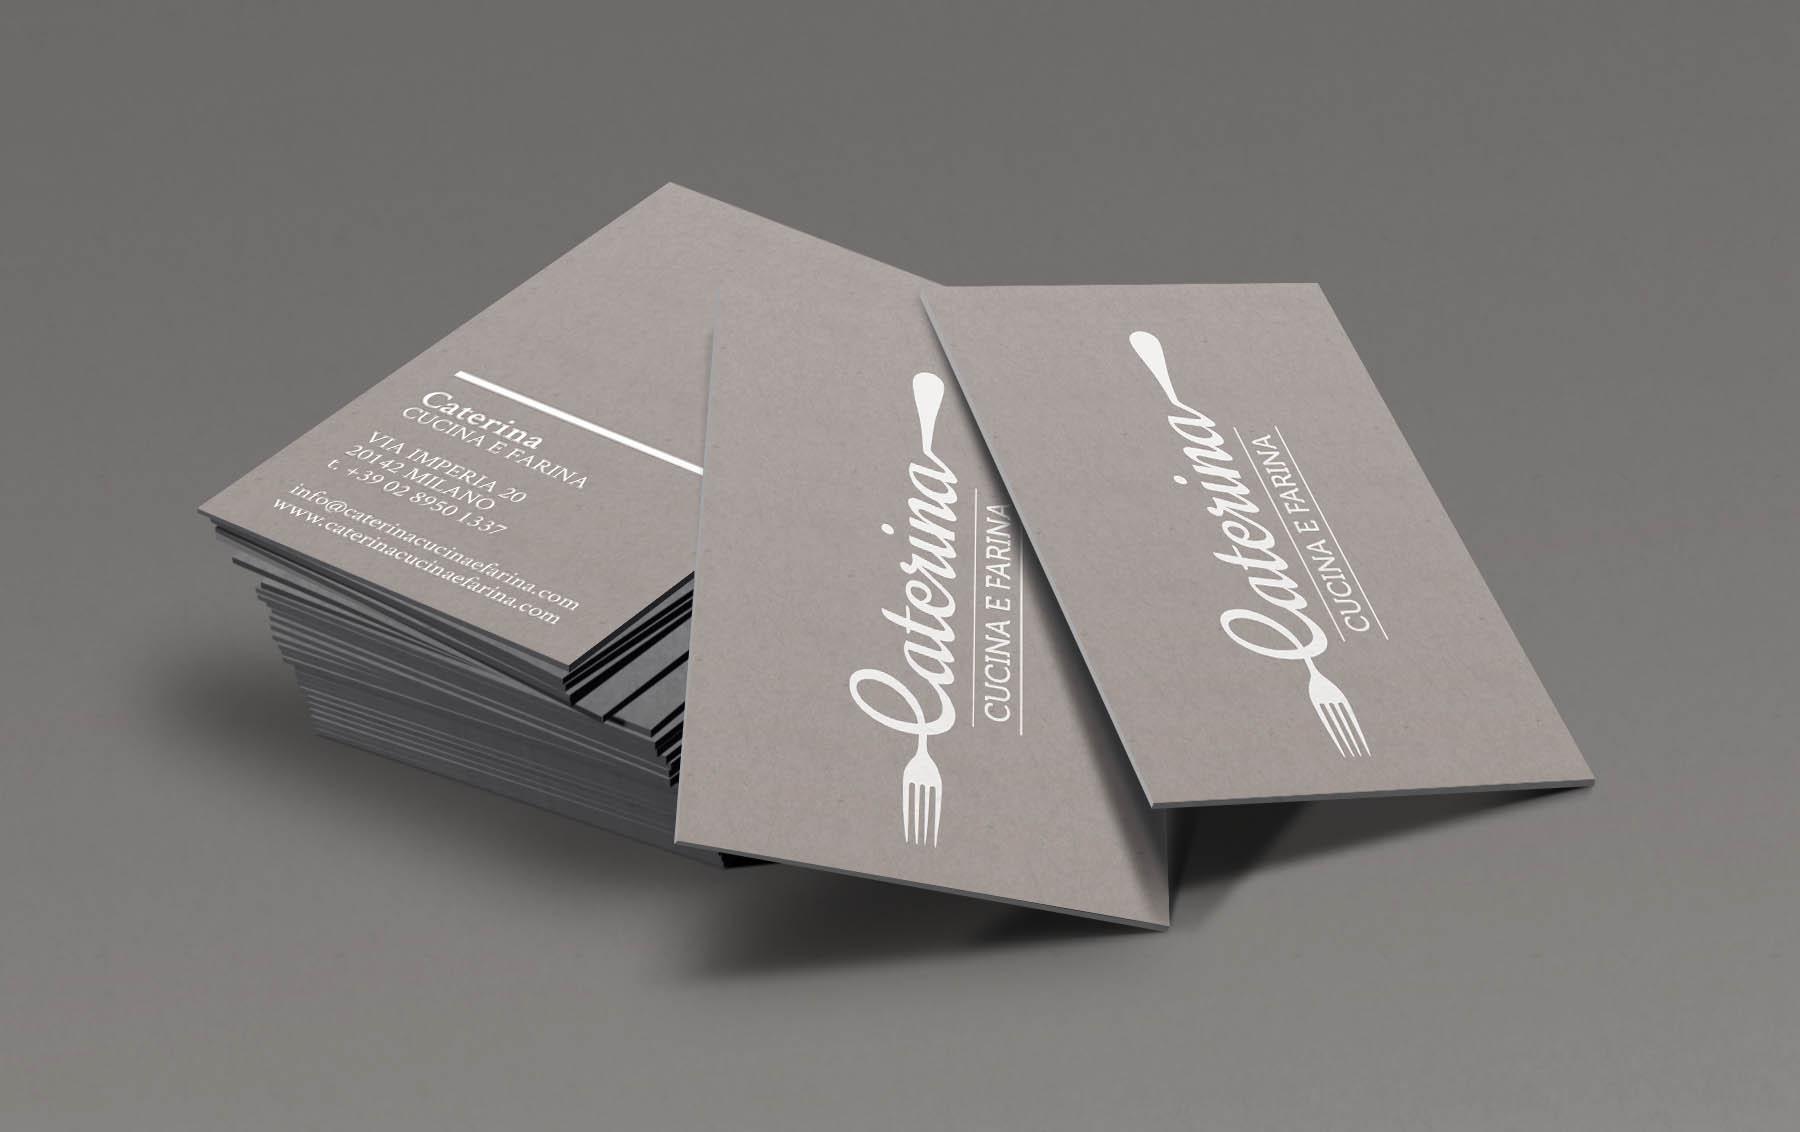 mintlab-brandidentity-caterina-business-card